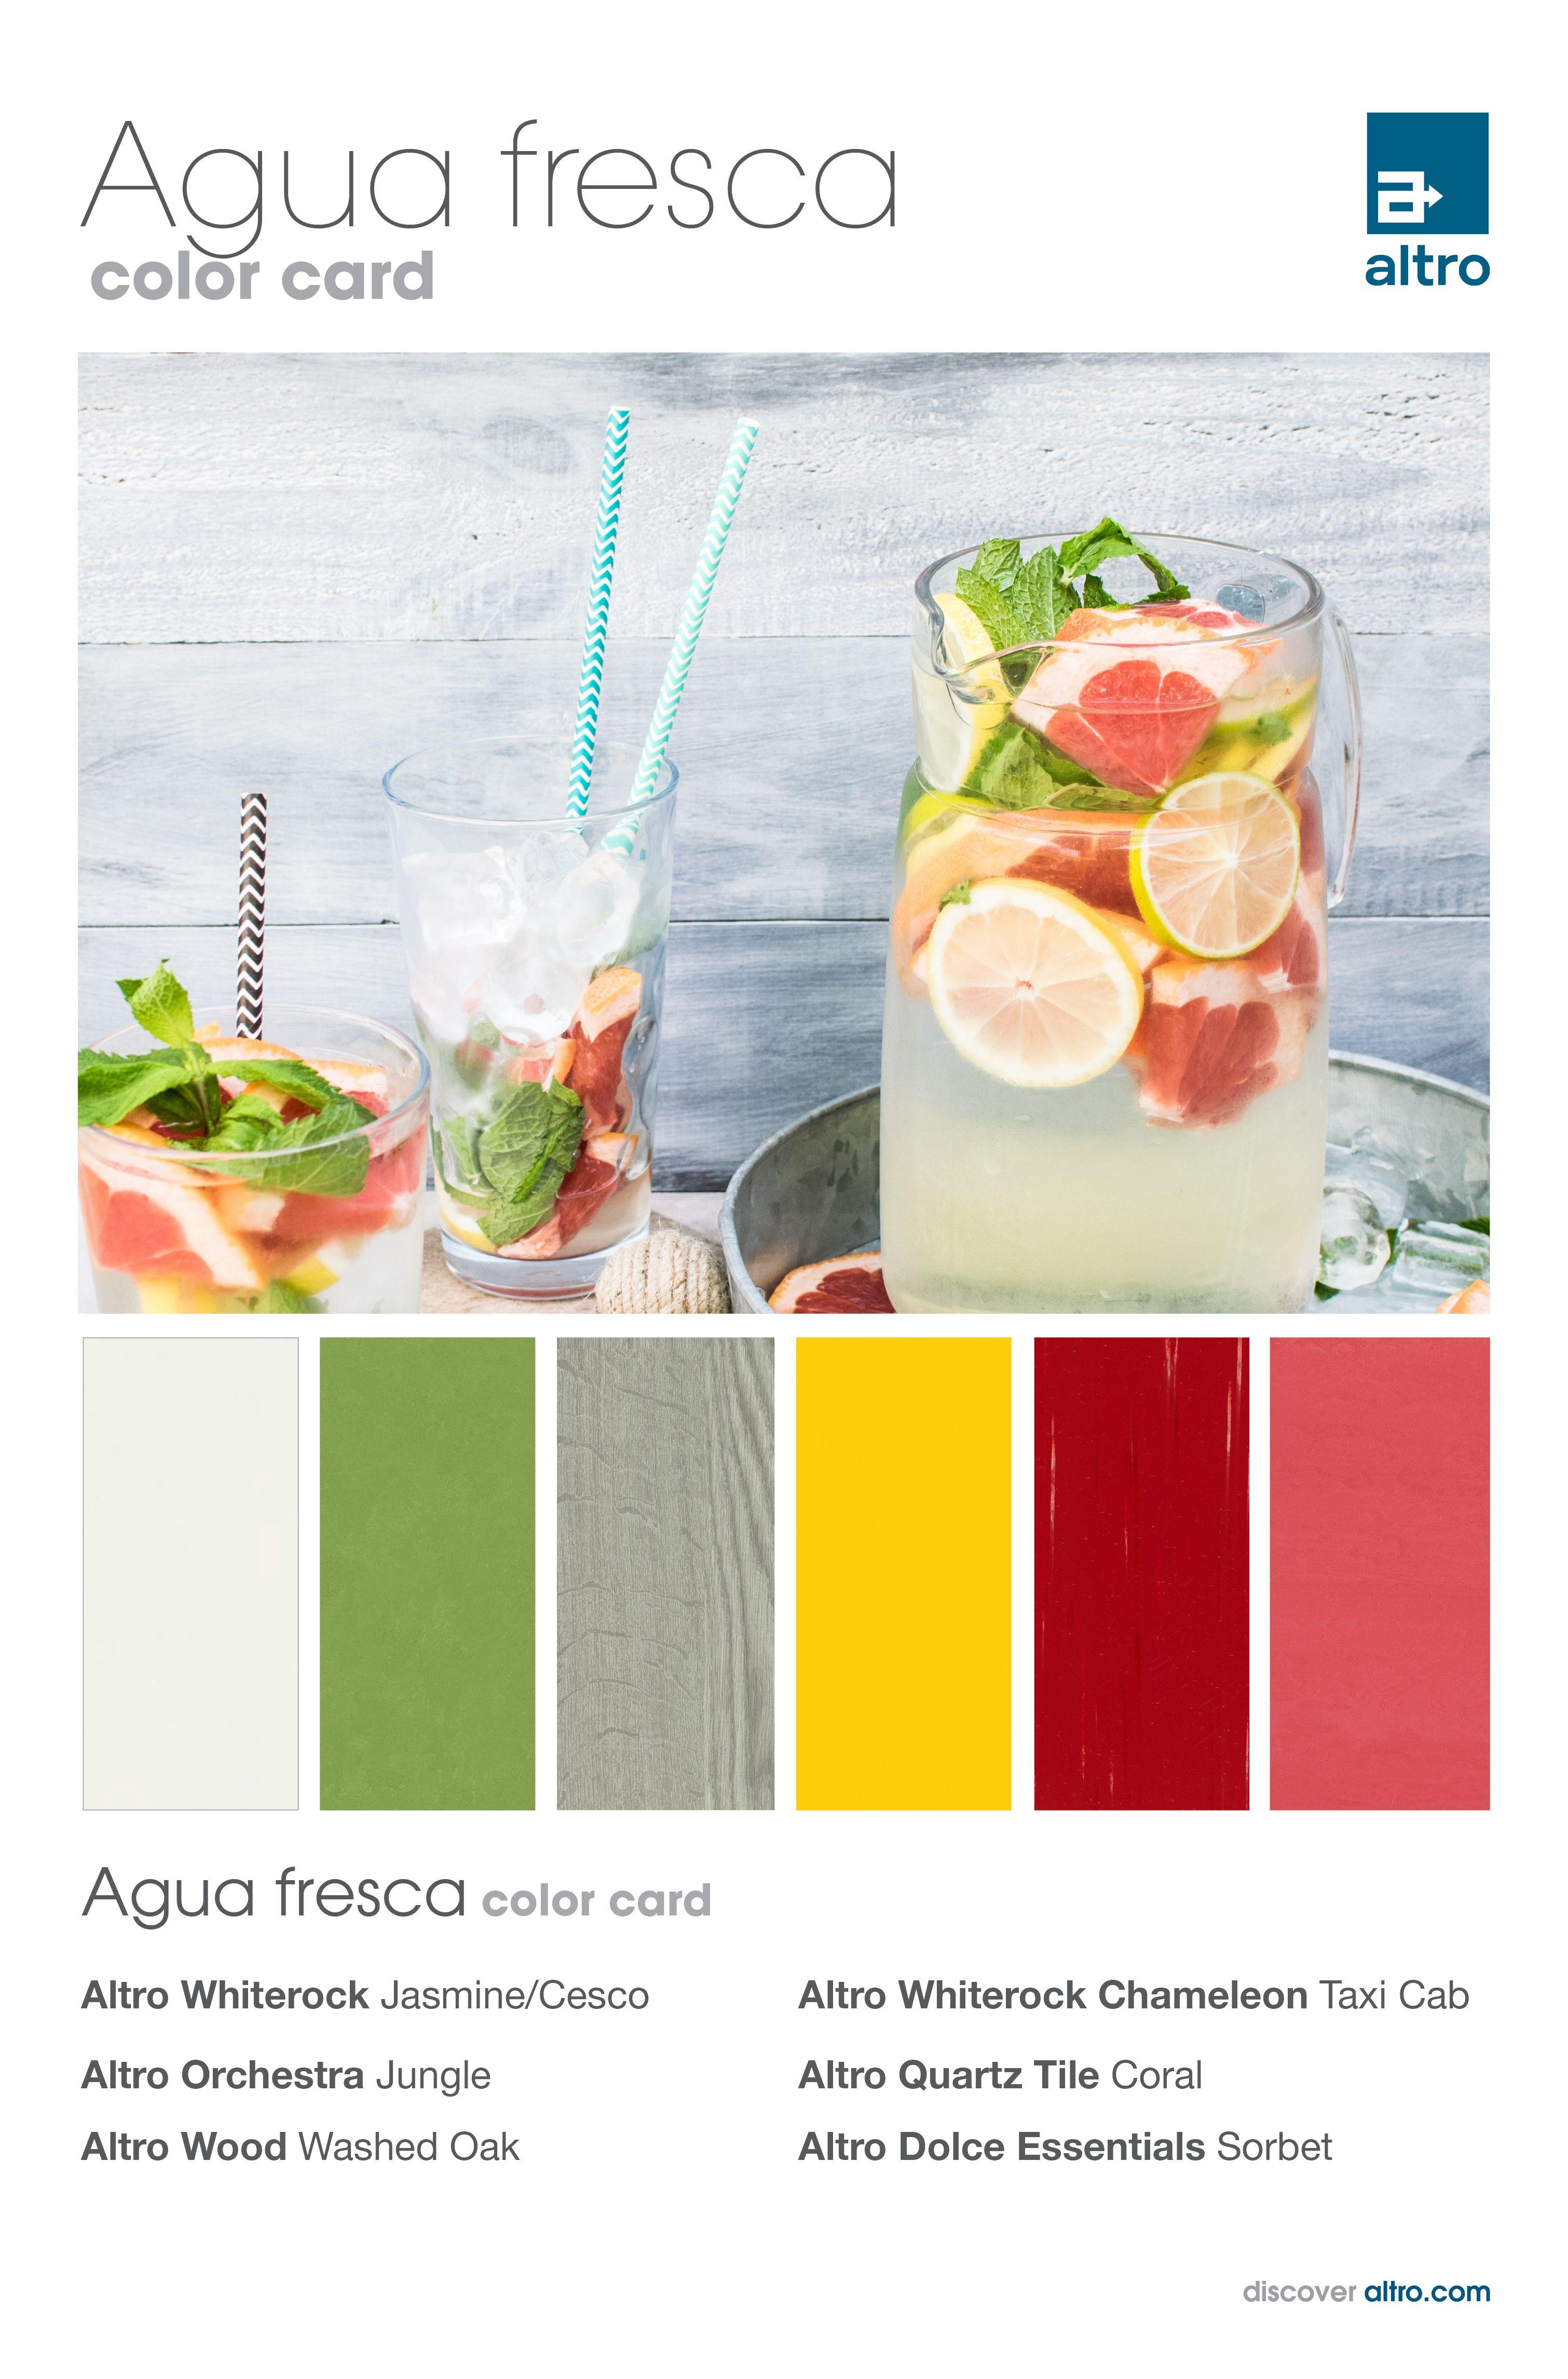 Agua fresca color card Commercial flooring, Color card